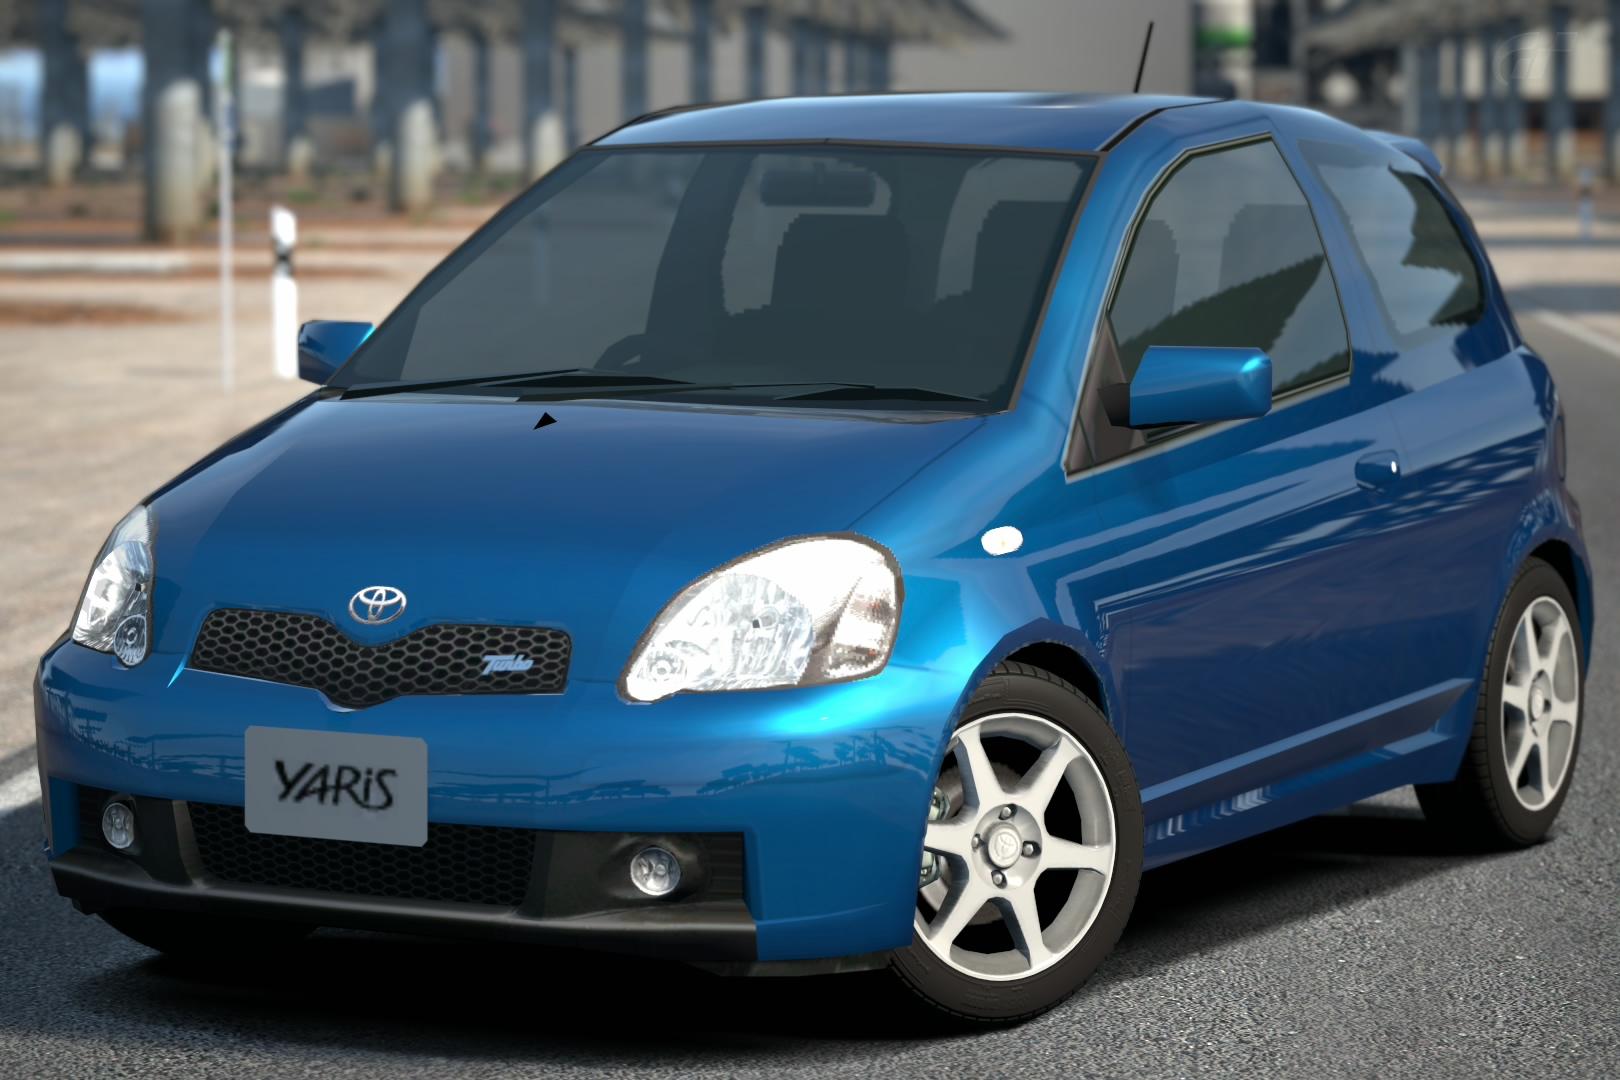 Toyota Yaris RS Turbo (J) '02 | Gran Turismo Wiki | FANDOM